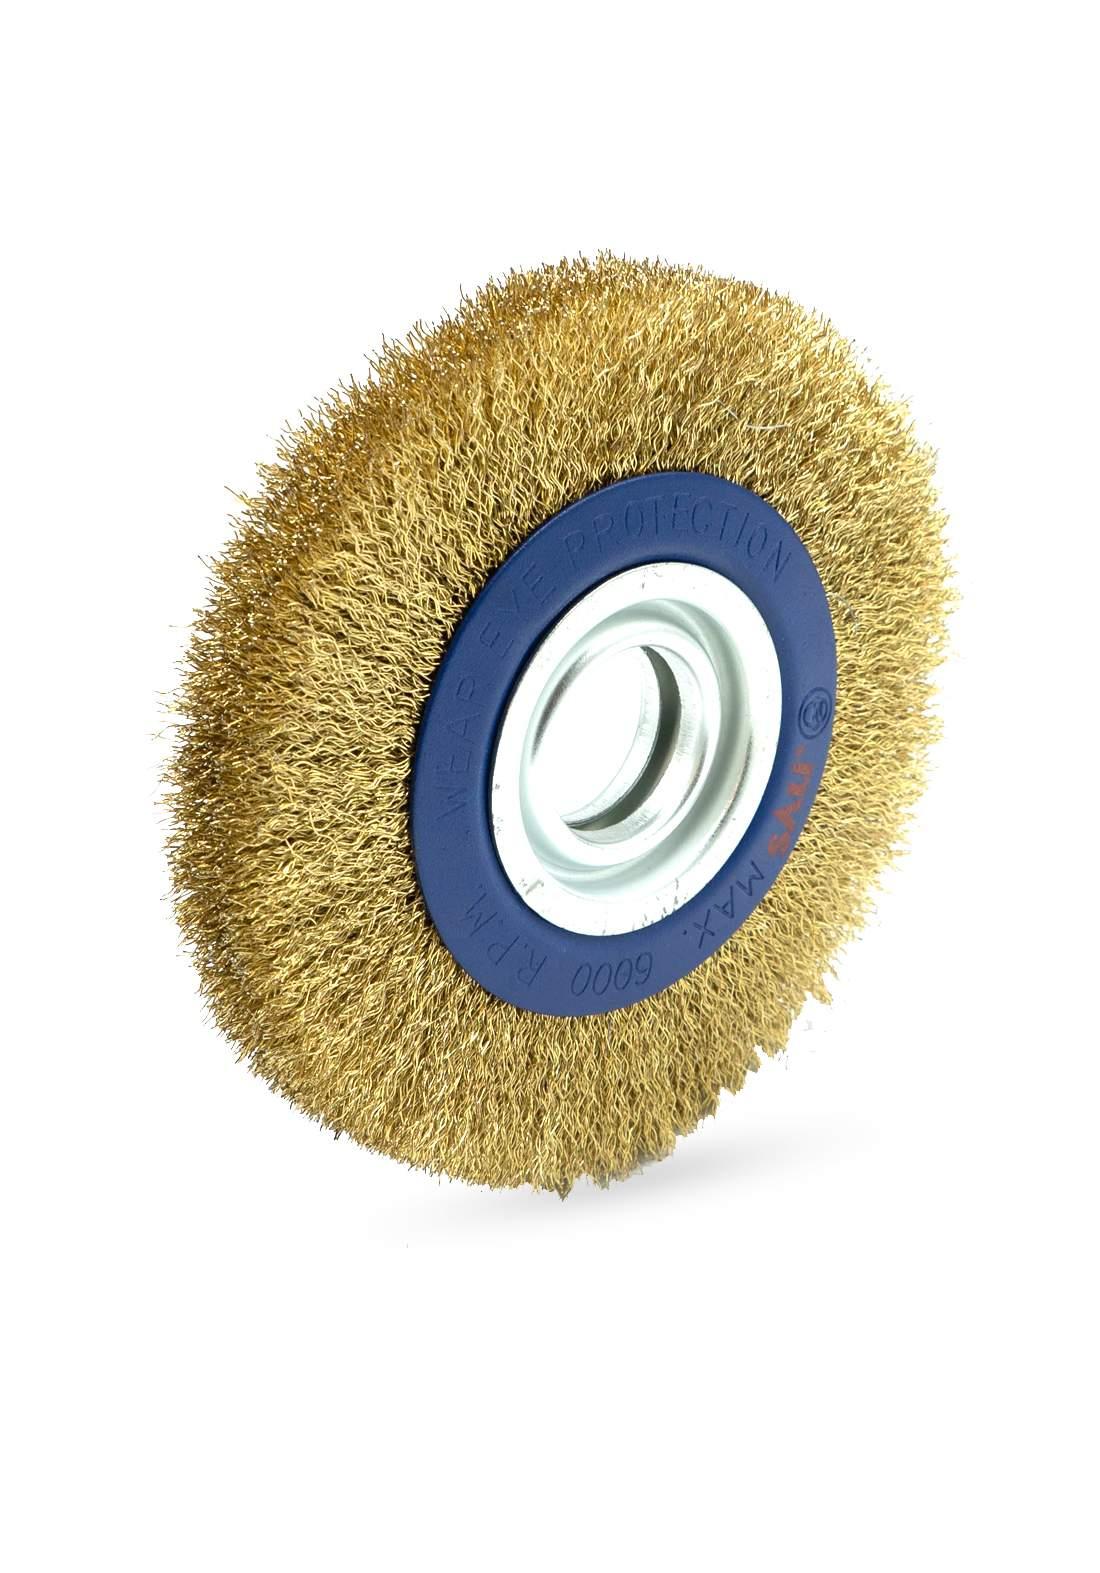 Sali 7229 Tools Wire Brush 100 mm فرشاة تنظيف الاسطح المعدنية